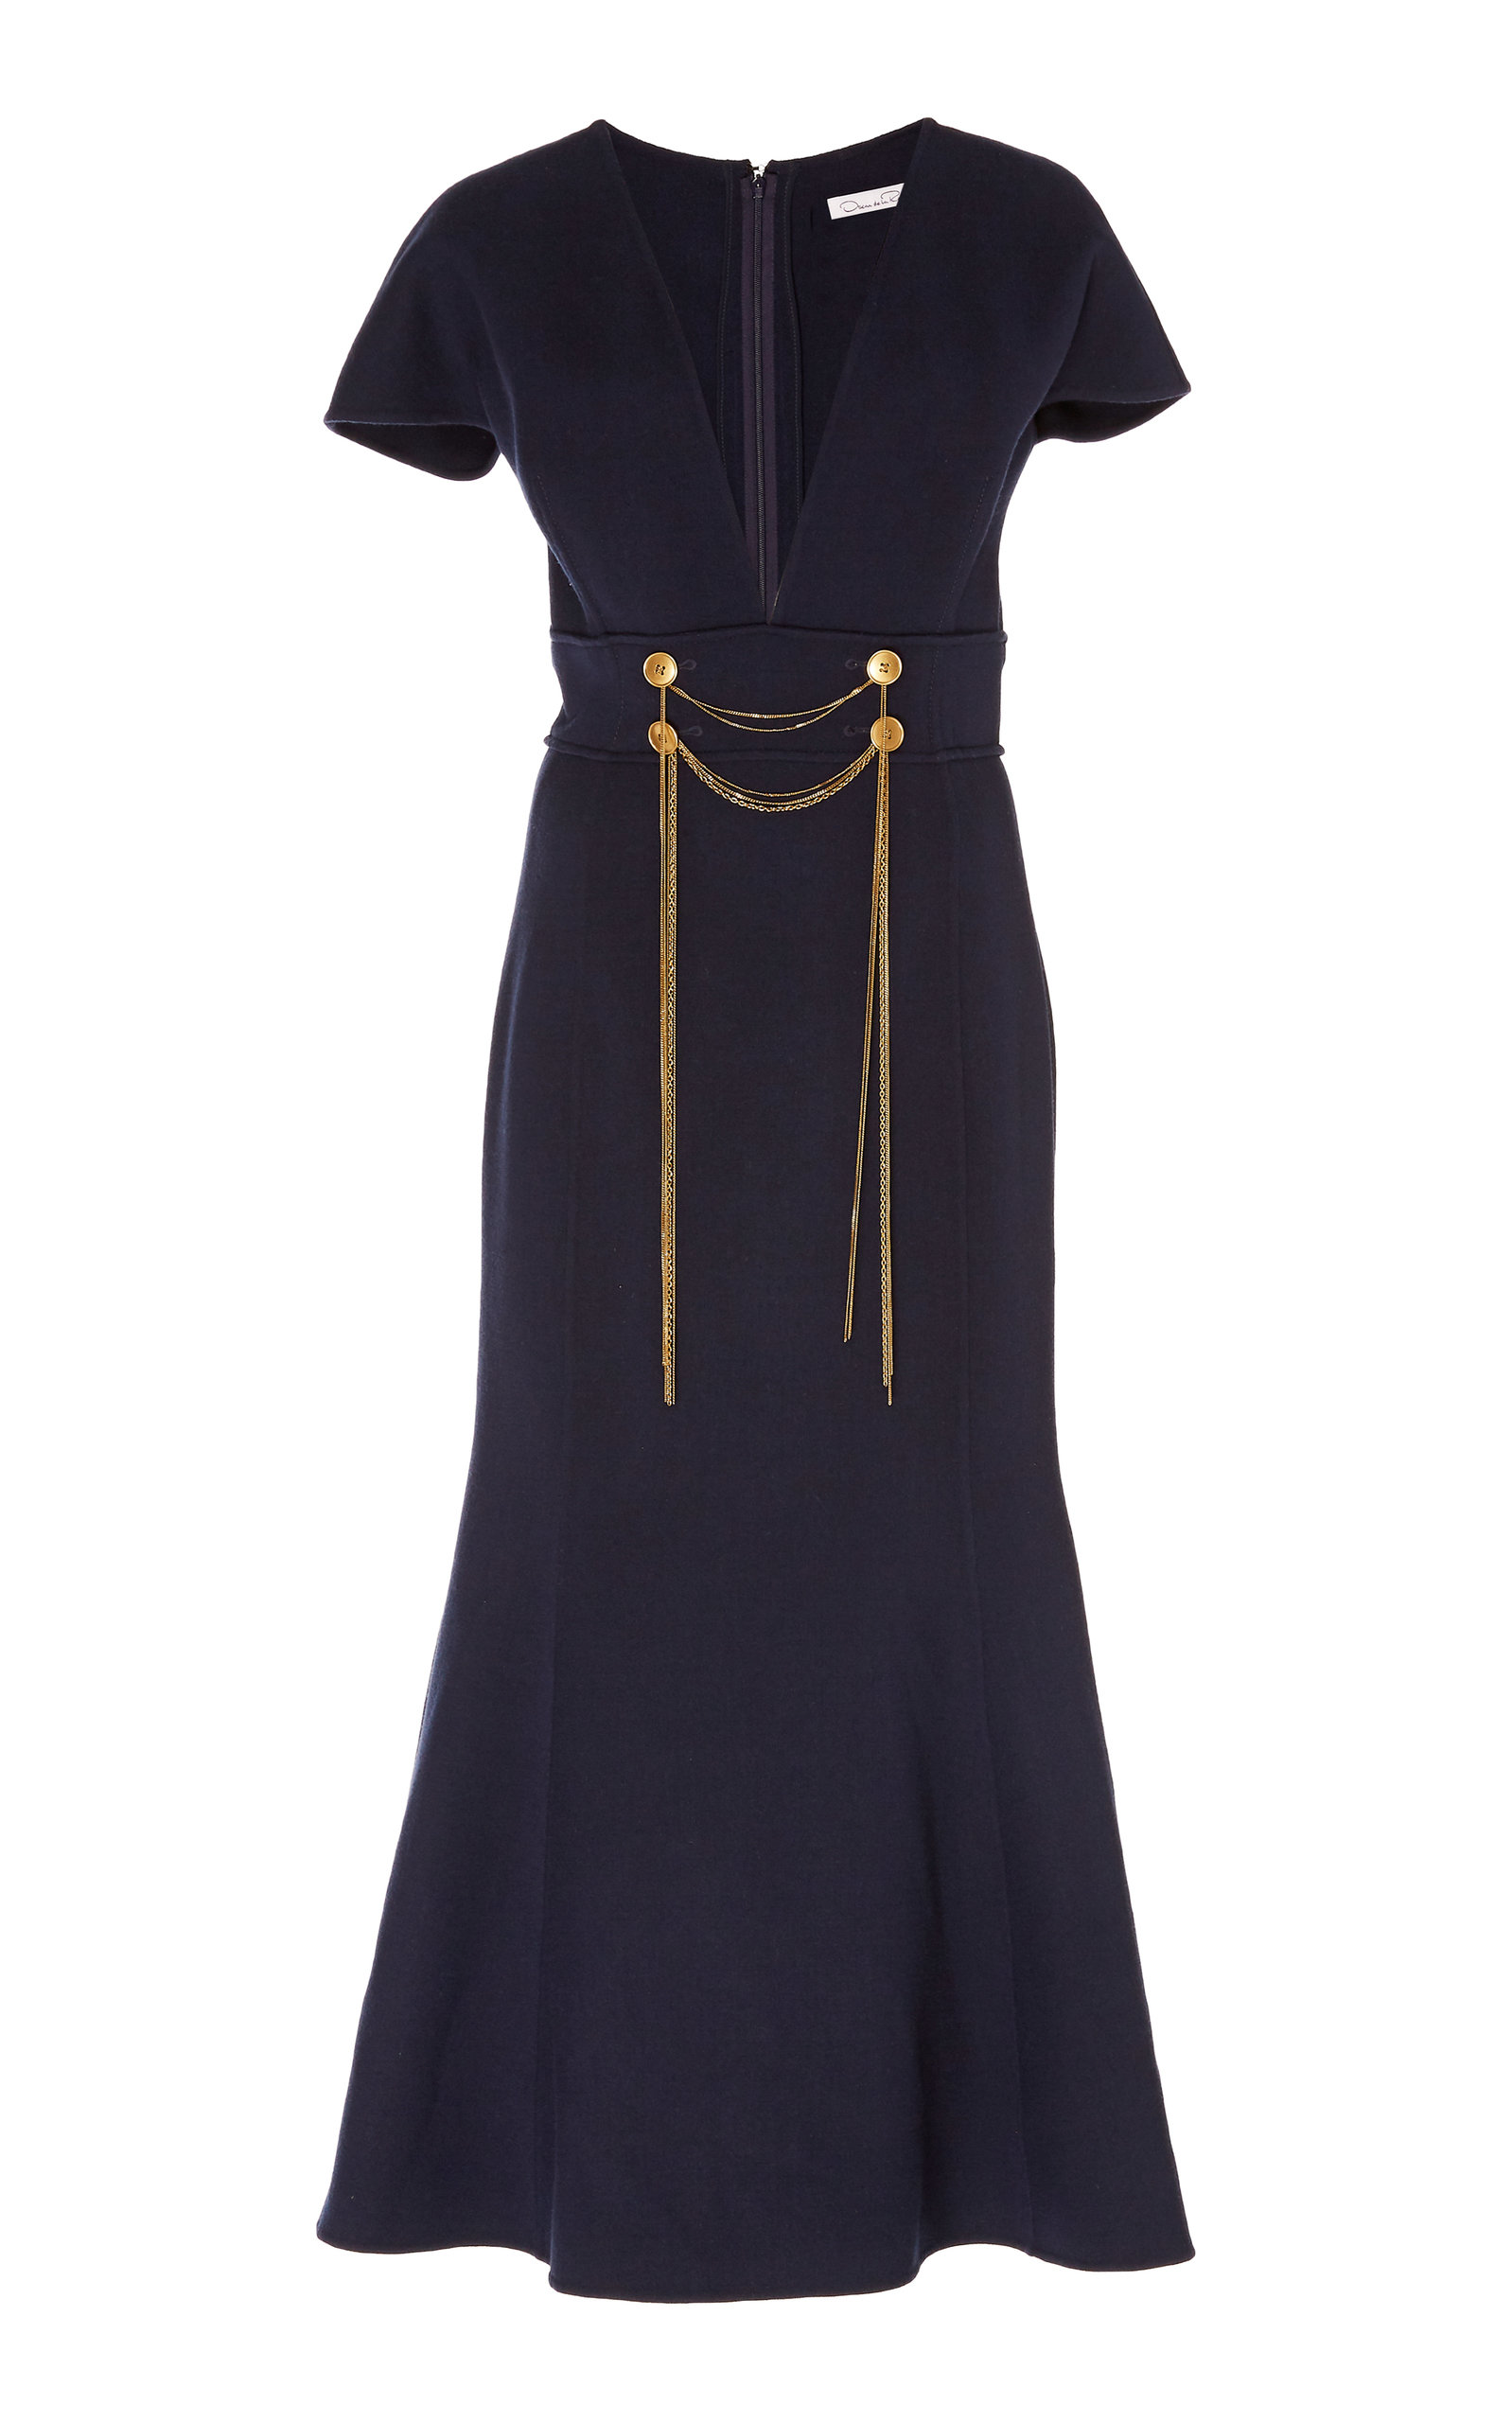 Buy Oscar de la Renta Embellished Wool-Blend Midi Dress online, shop Oscar de la Renta at the best price